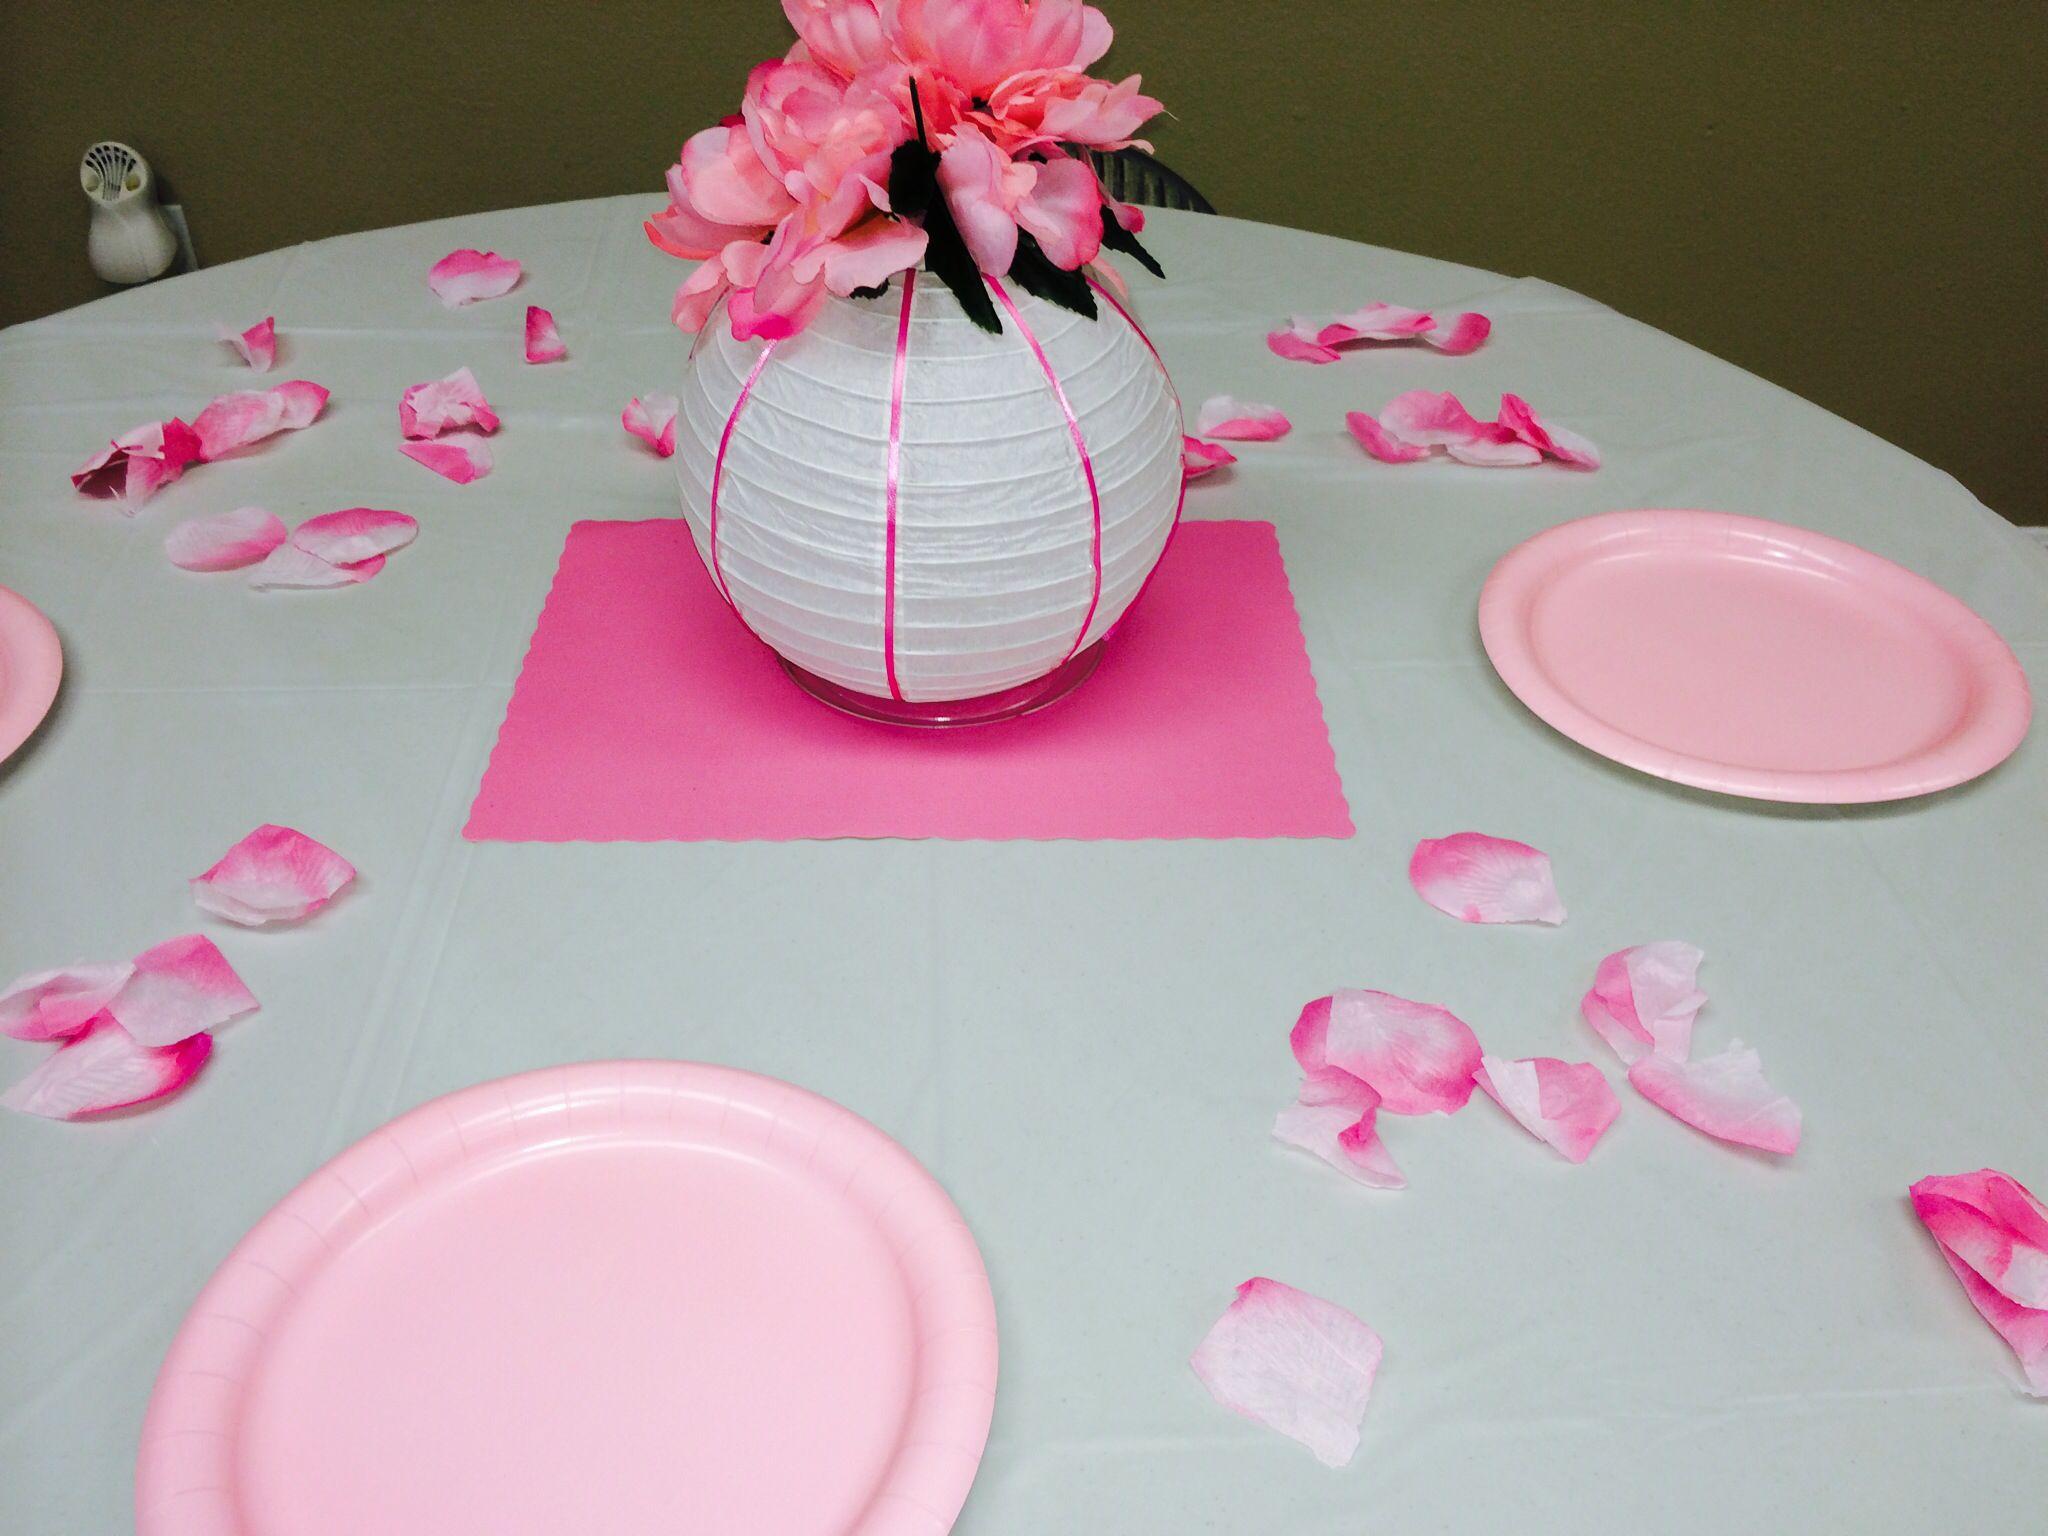 Lantern centerpieces | Events and Weddings | Pinterest | Lantern ...